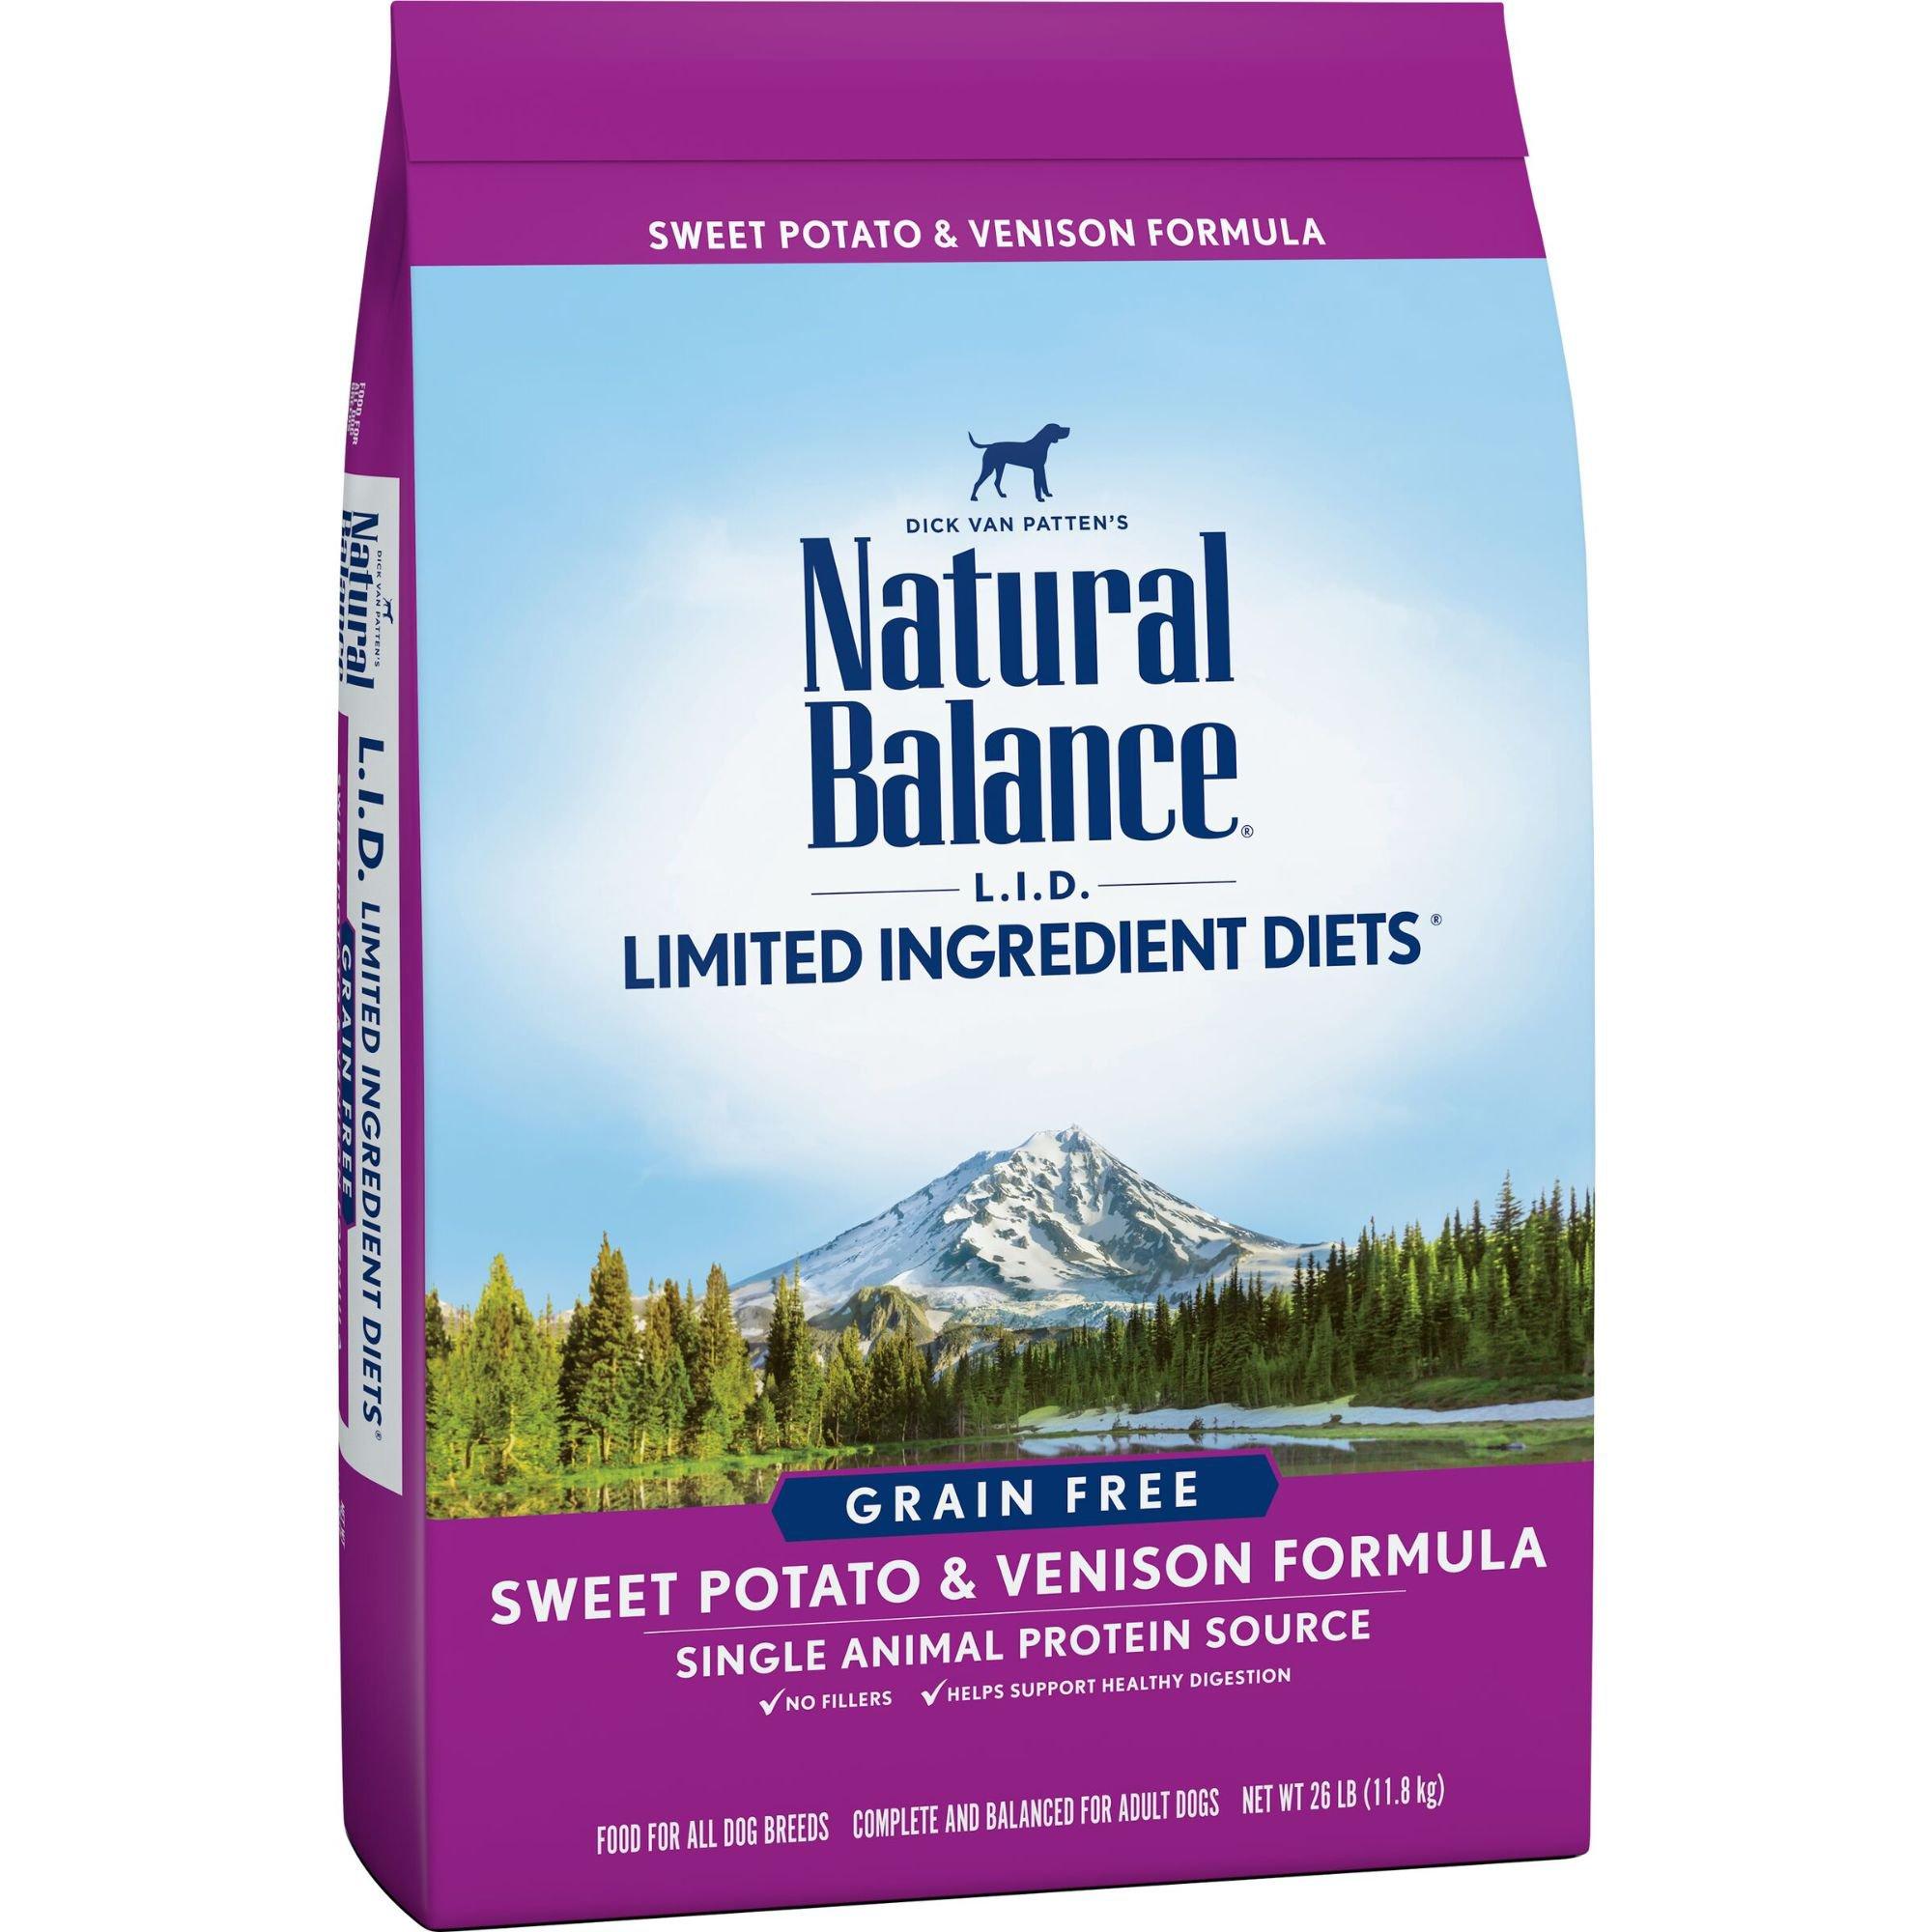 Natural Balance L.I.D. Limited Ingredient Diets Sweet Potato & Venison Grain Free Dog Food | Petco